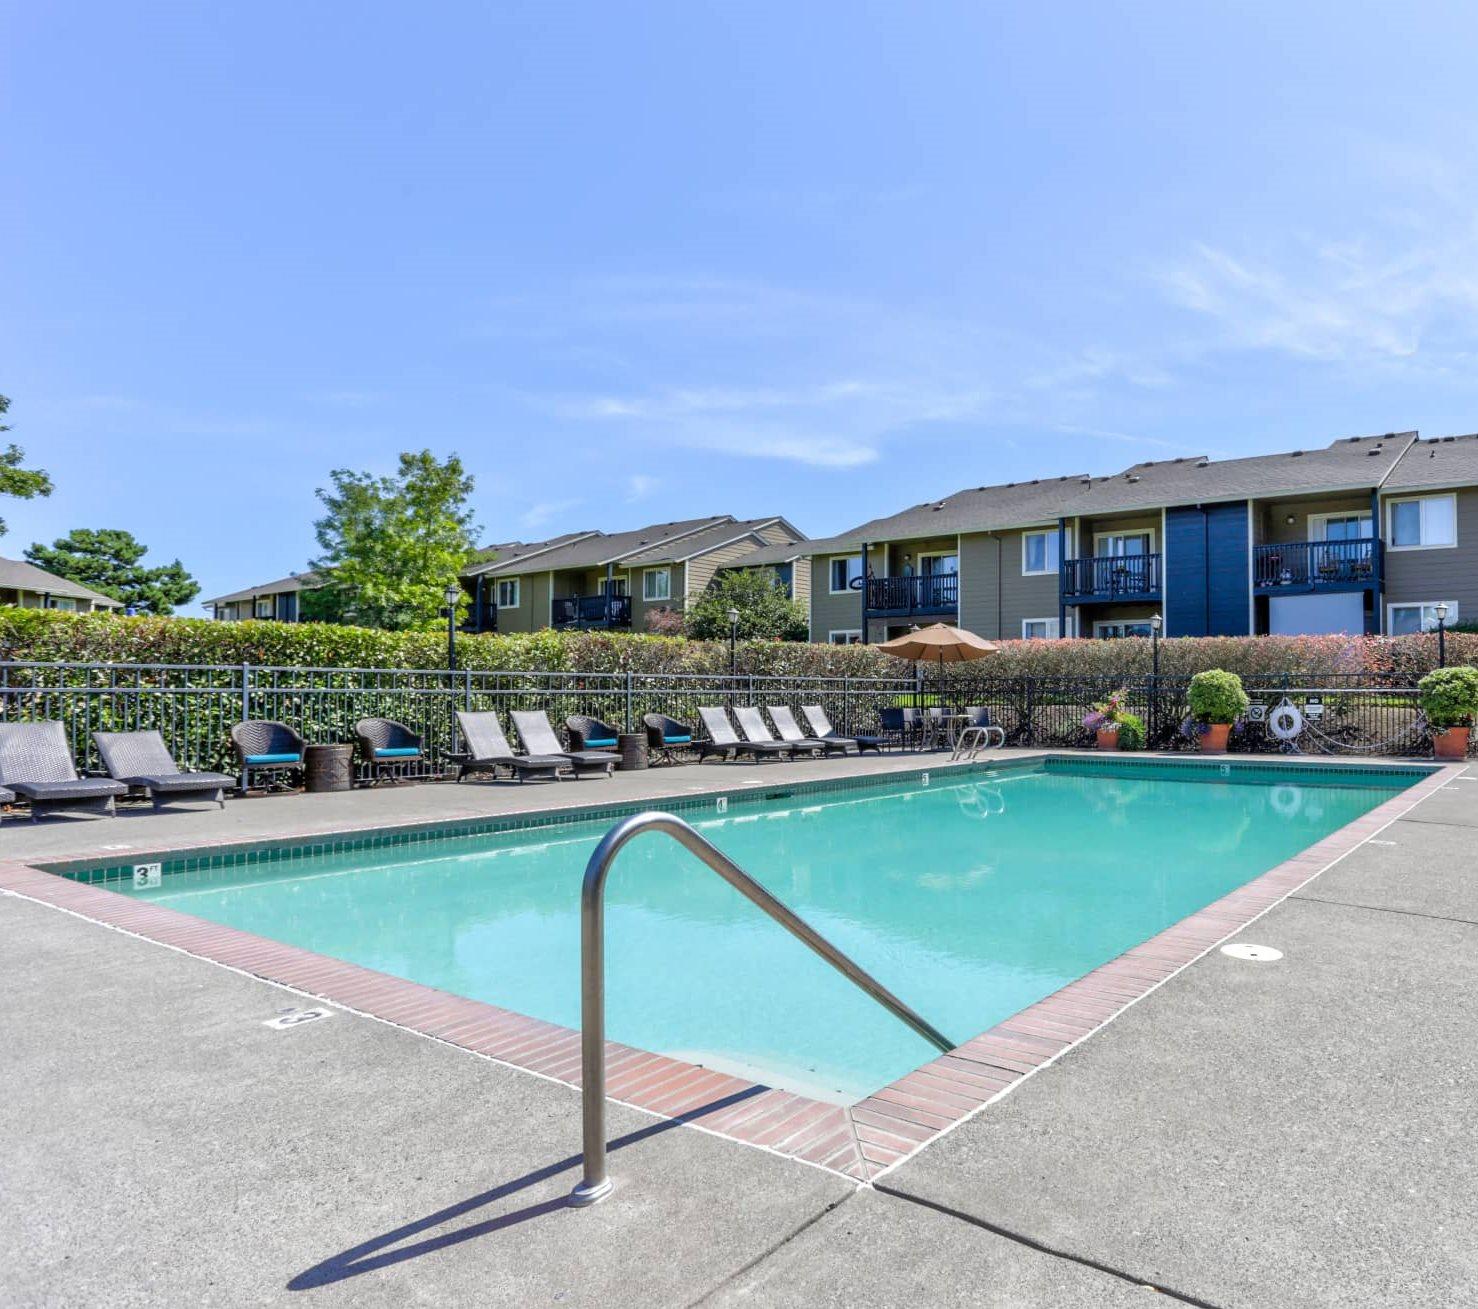 Greenbrier Tanasbourne Outdoor Pool